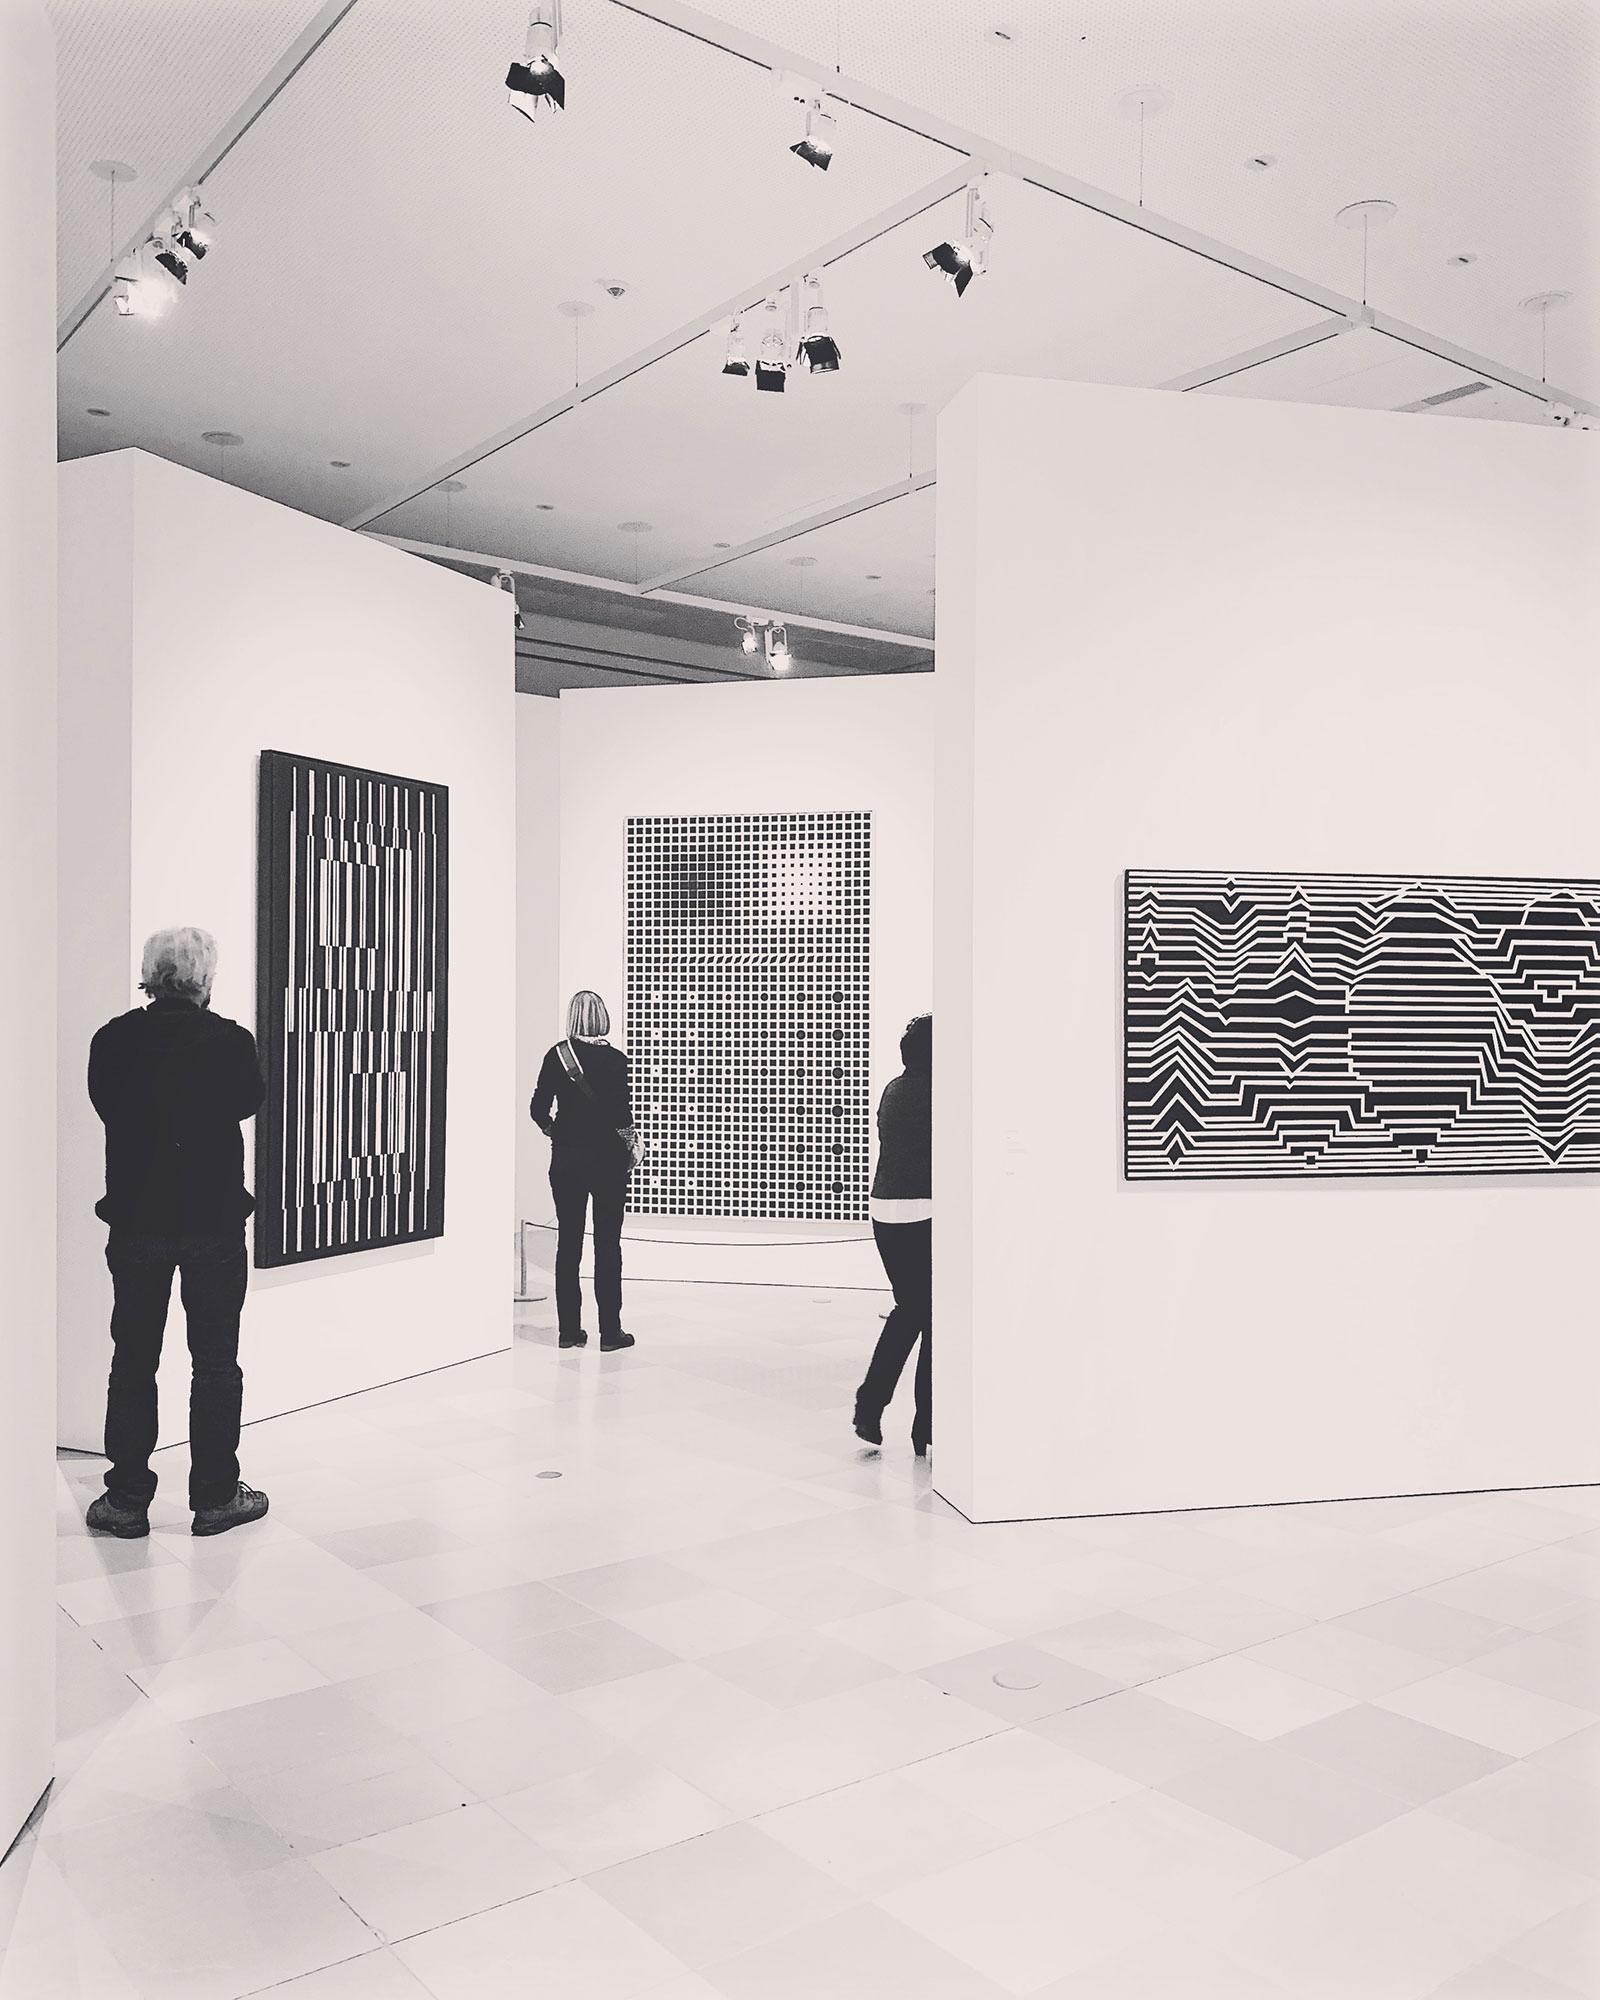 Victor Vasarely, Städl Museum, Frankfurt, January 2019